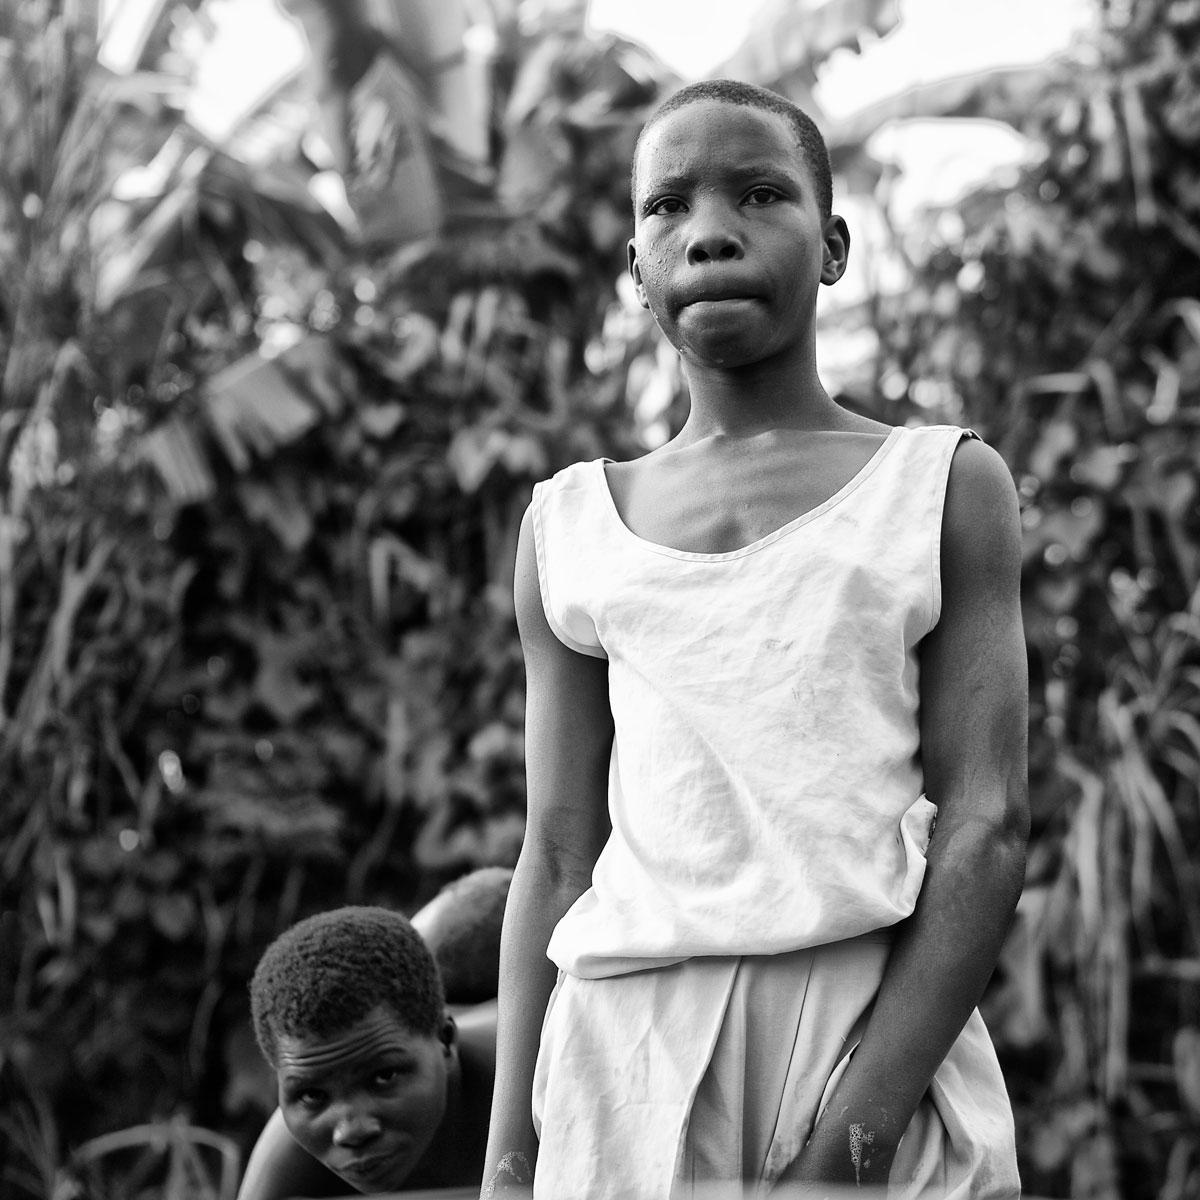 uganda_065_SP